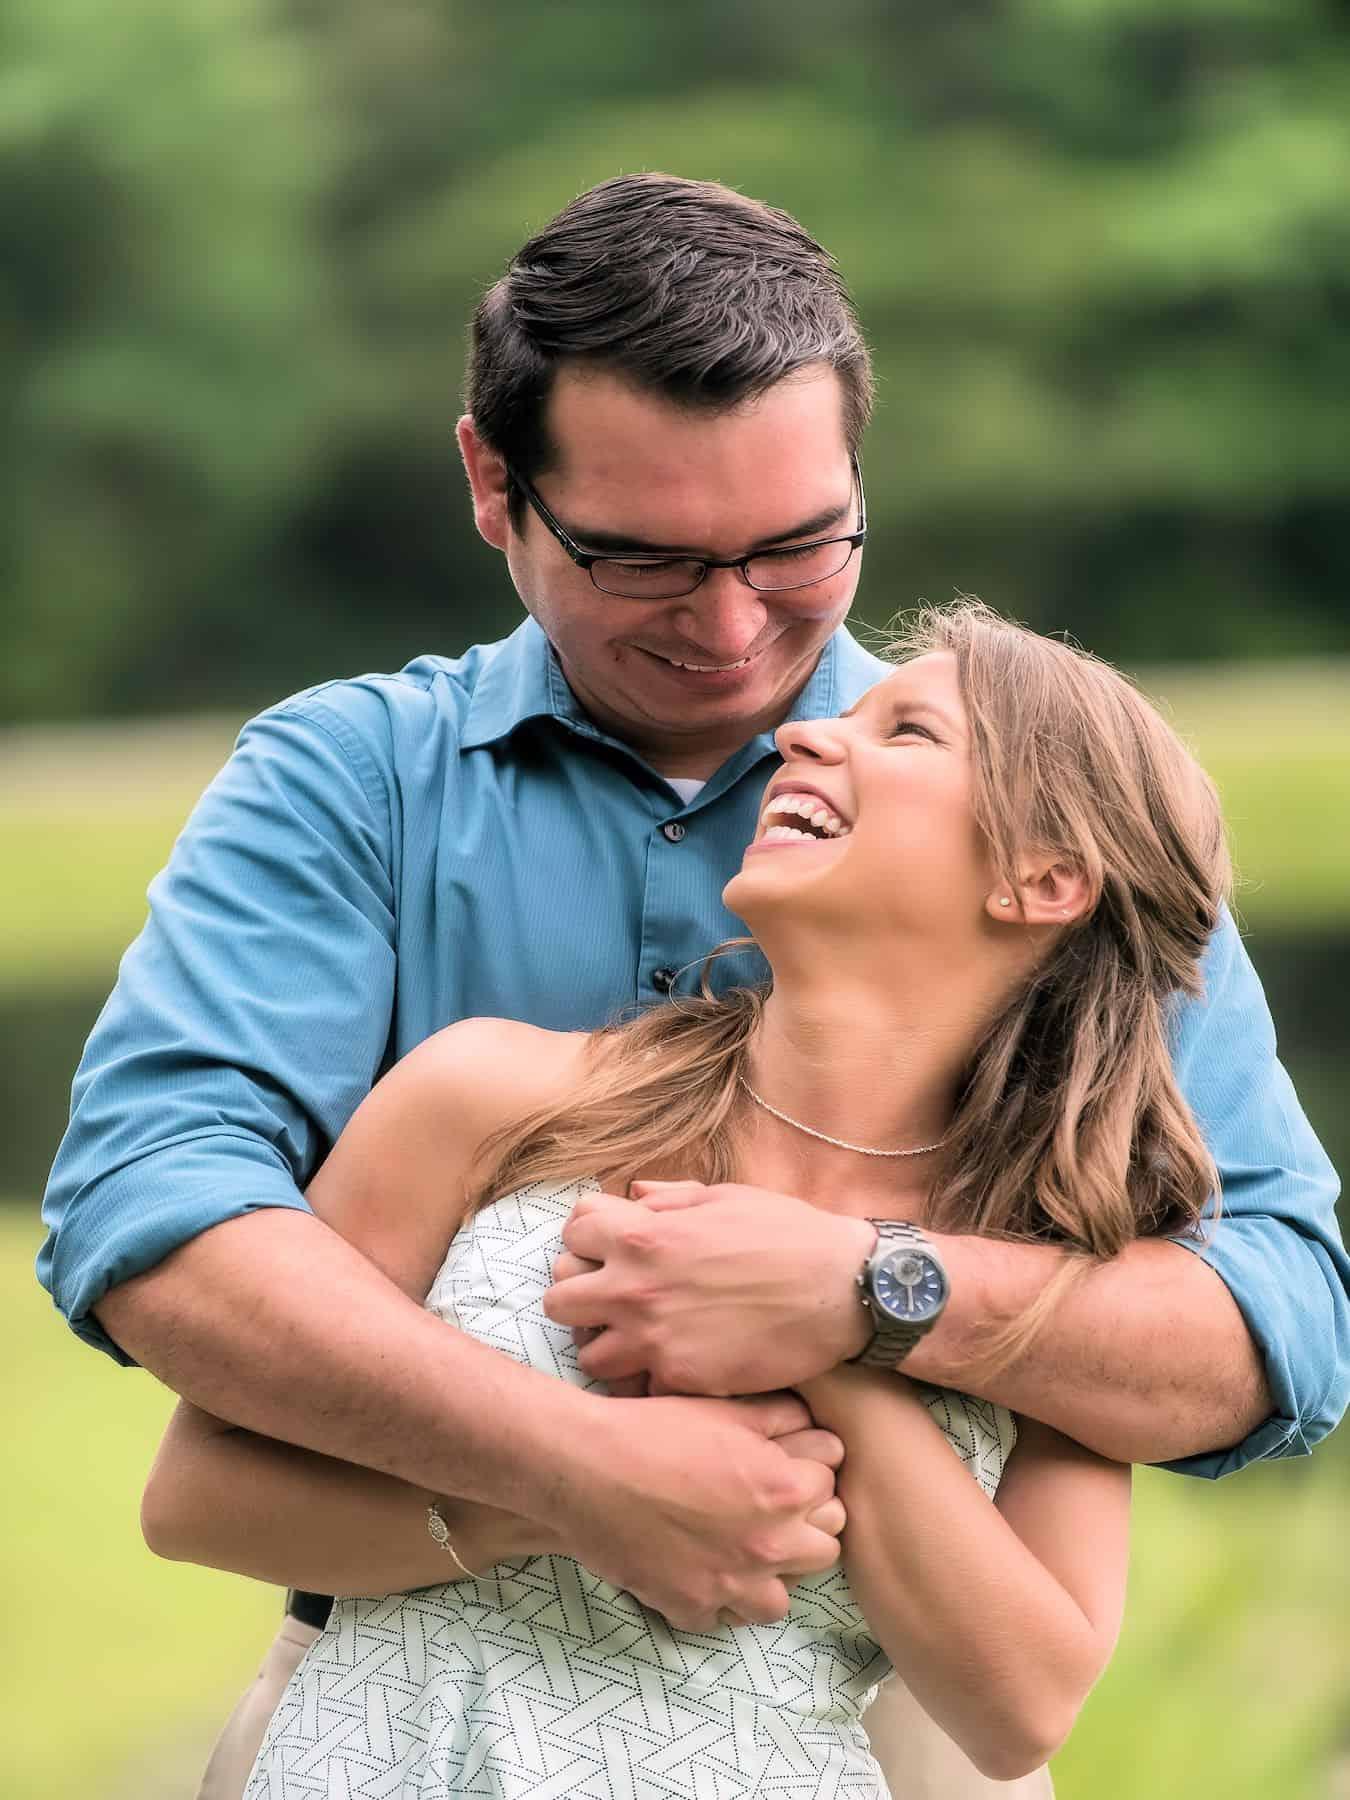 Playful embrace by newly engaged couple